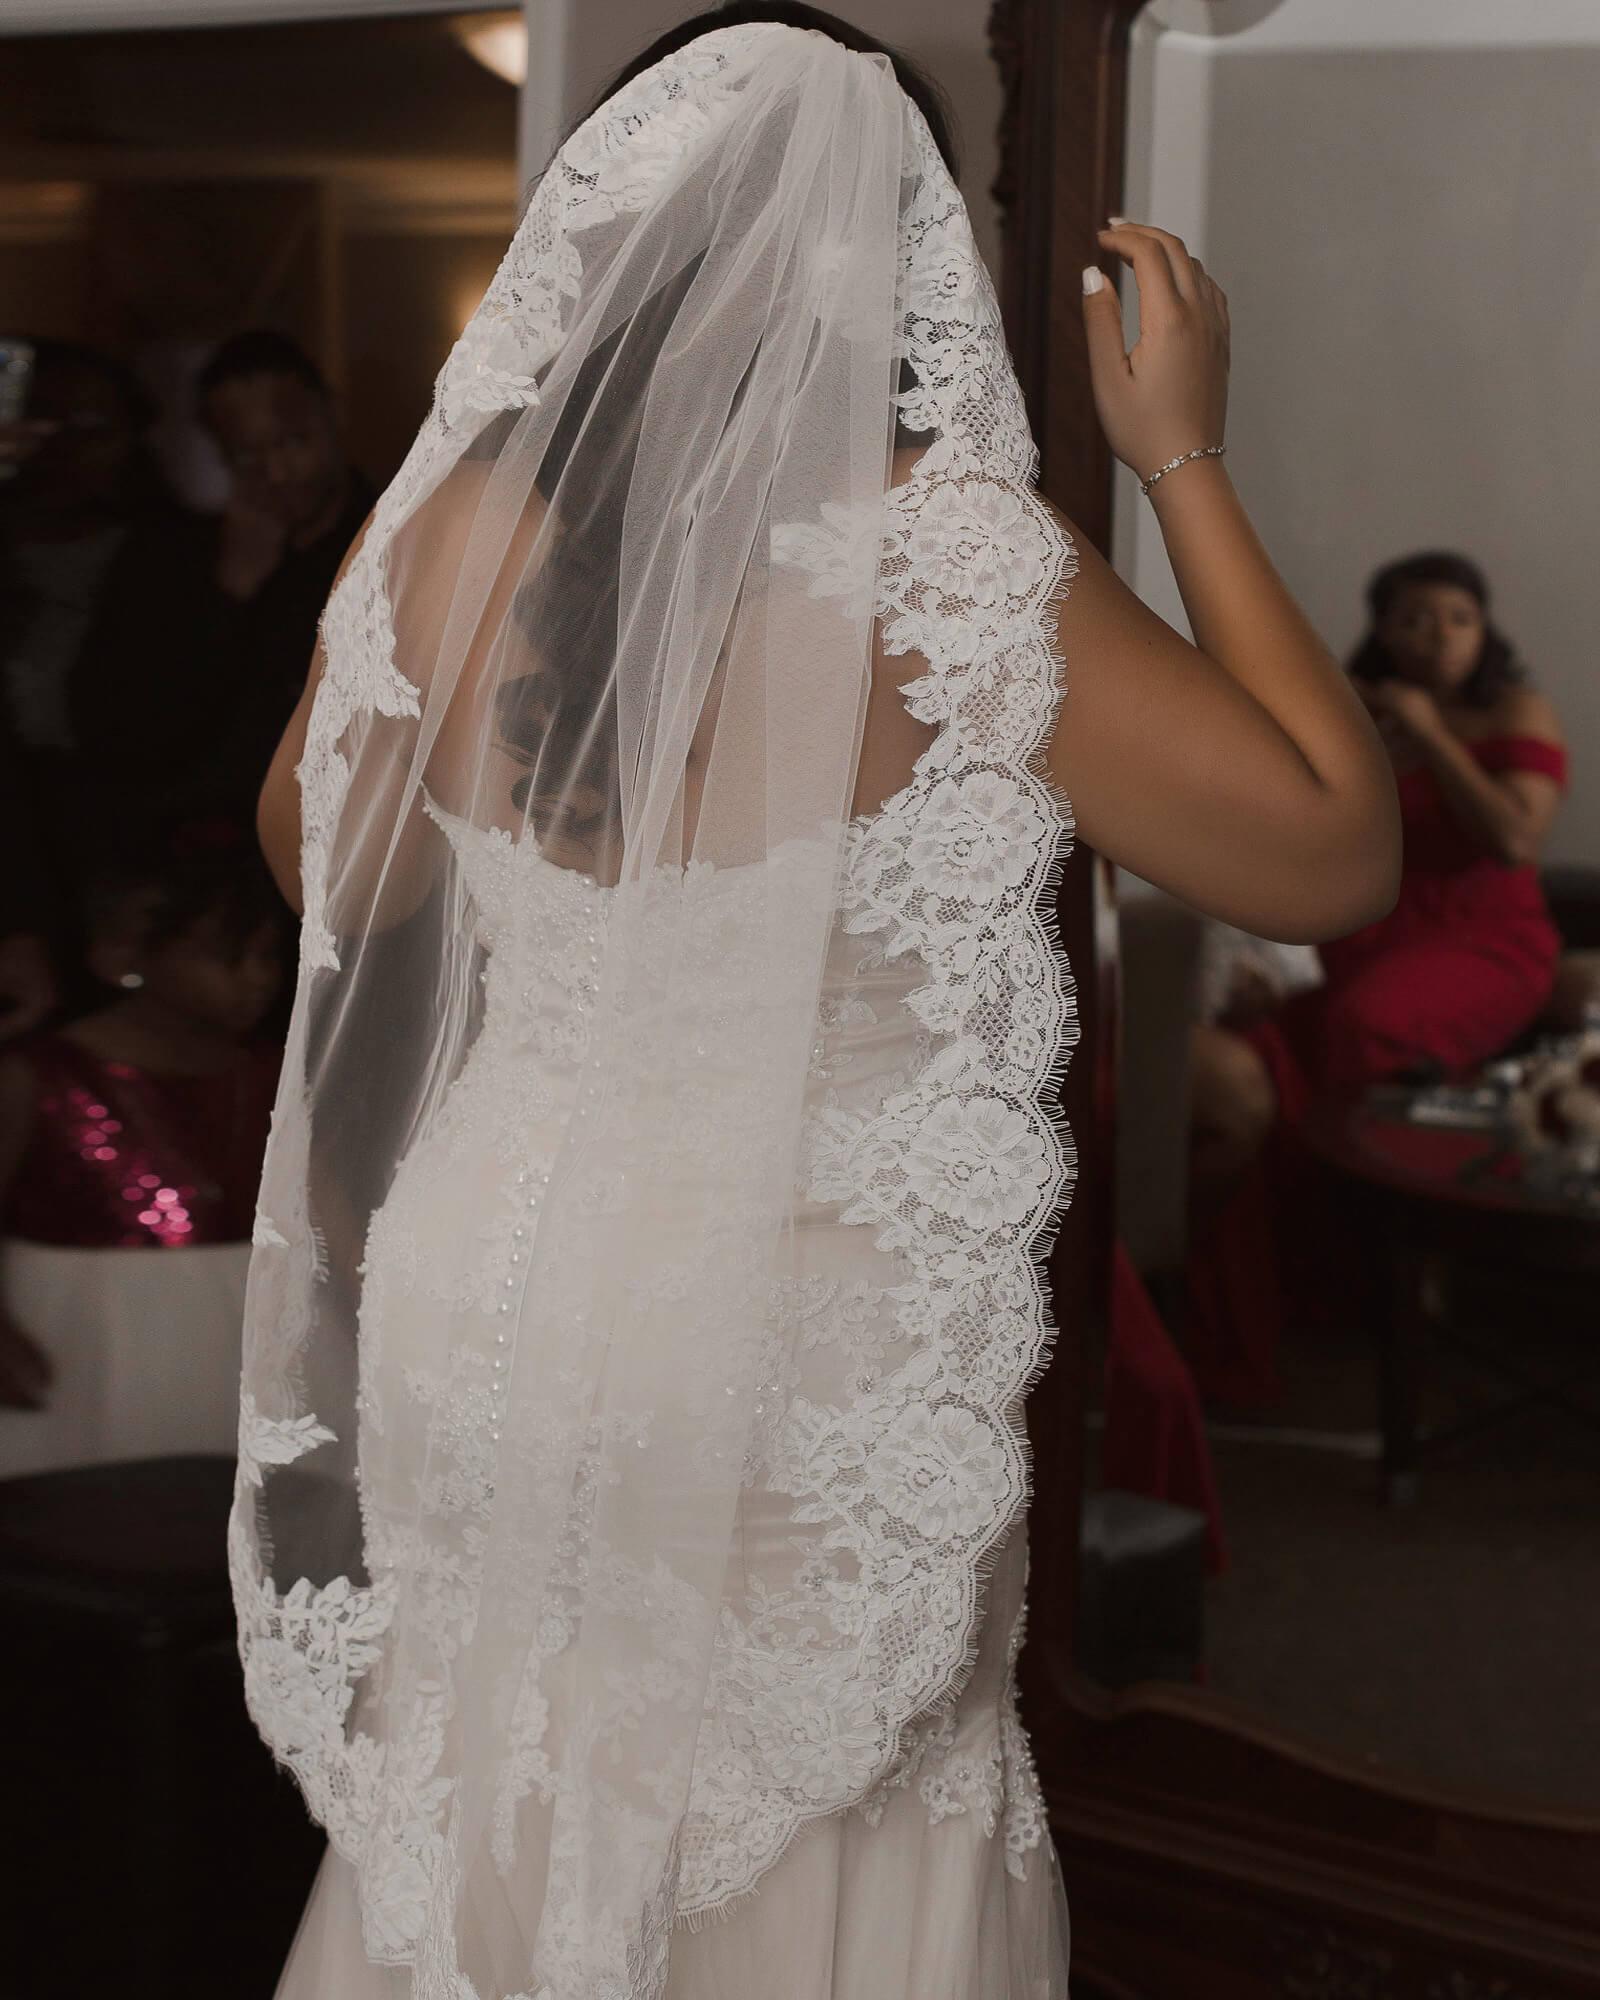 Customized Matching Veil! How Stunning!